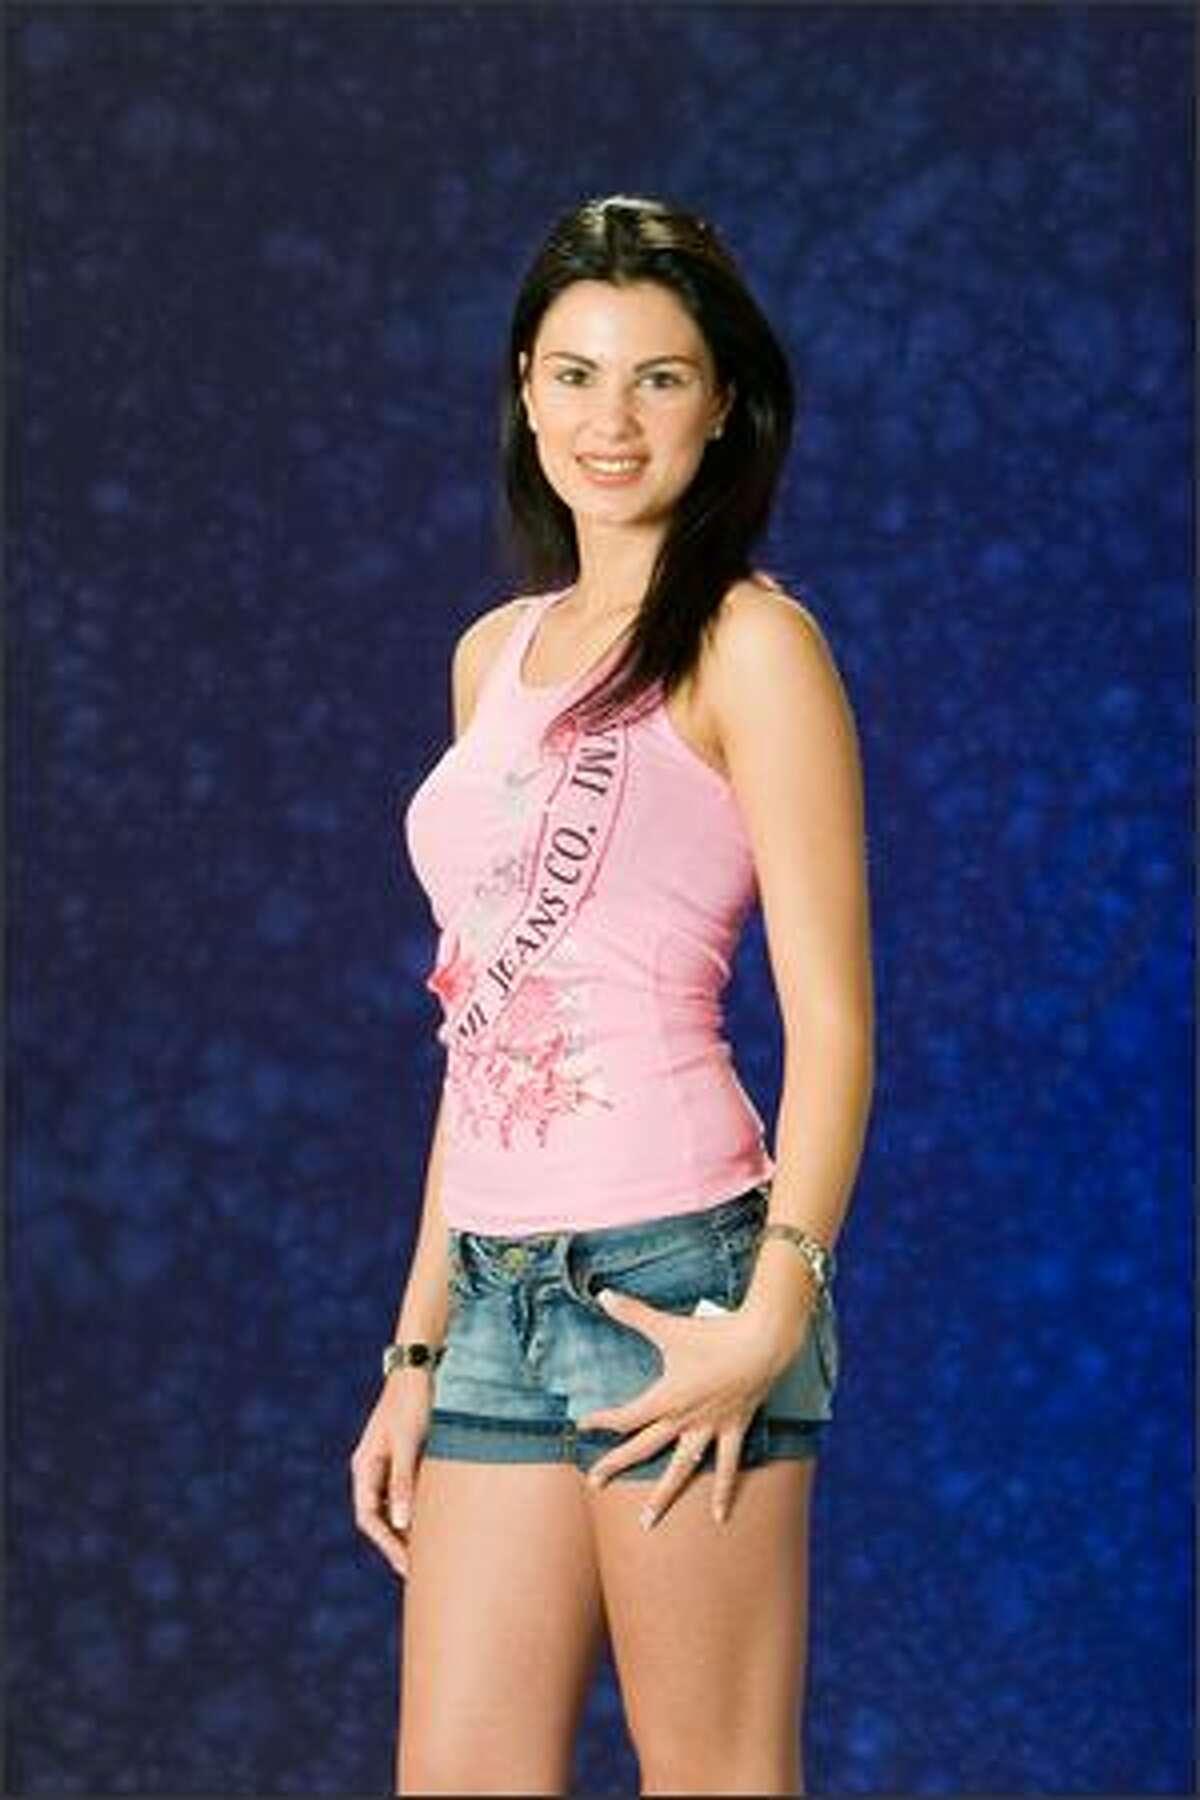 Ildiko Bona, Miss Hungary 2007.